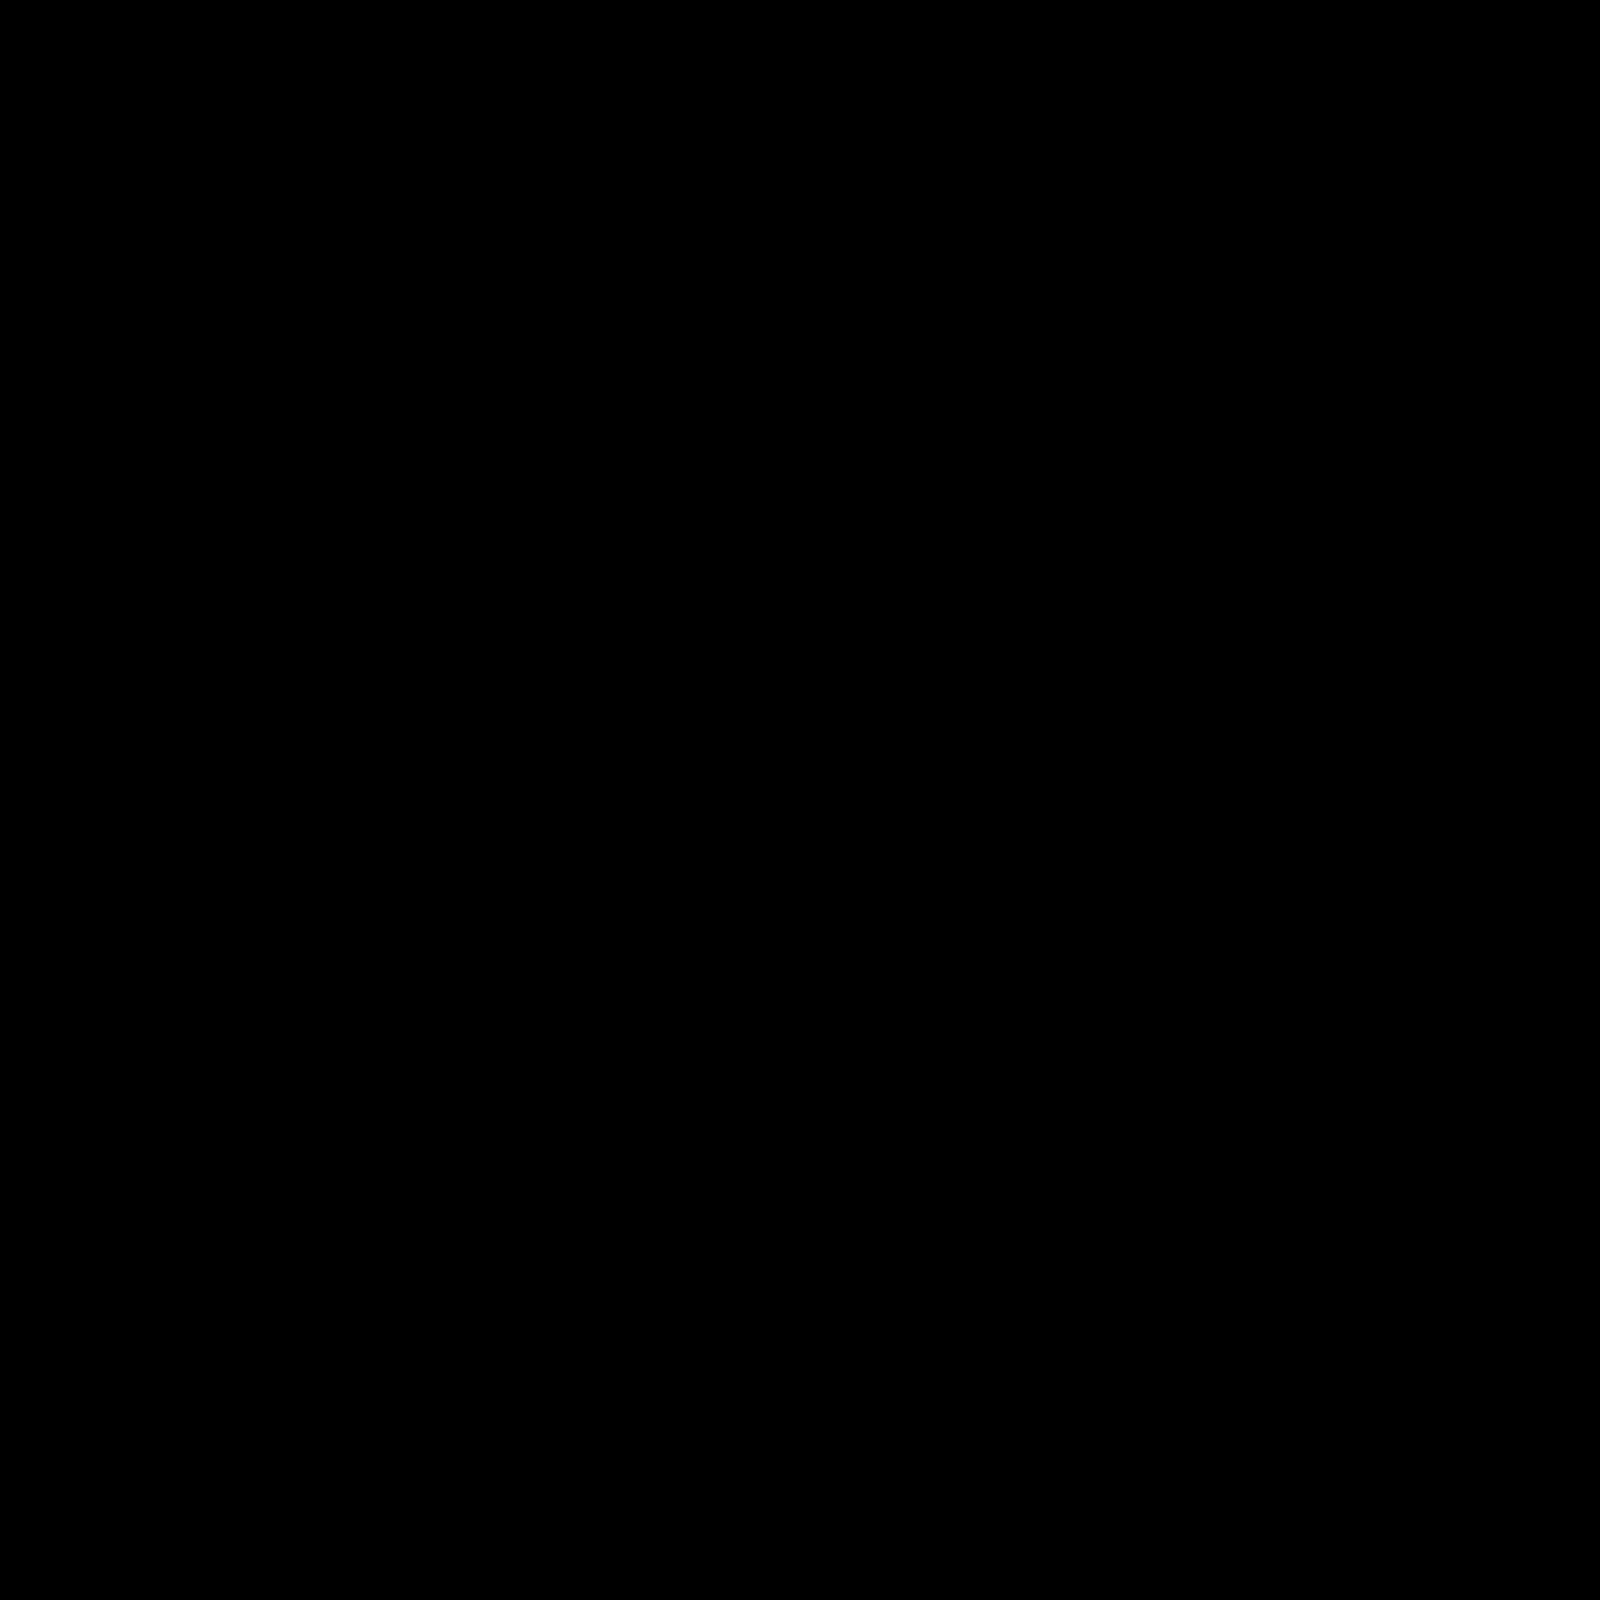 Eksplozja icon